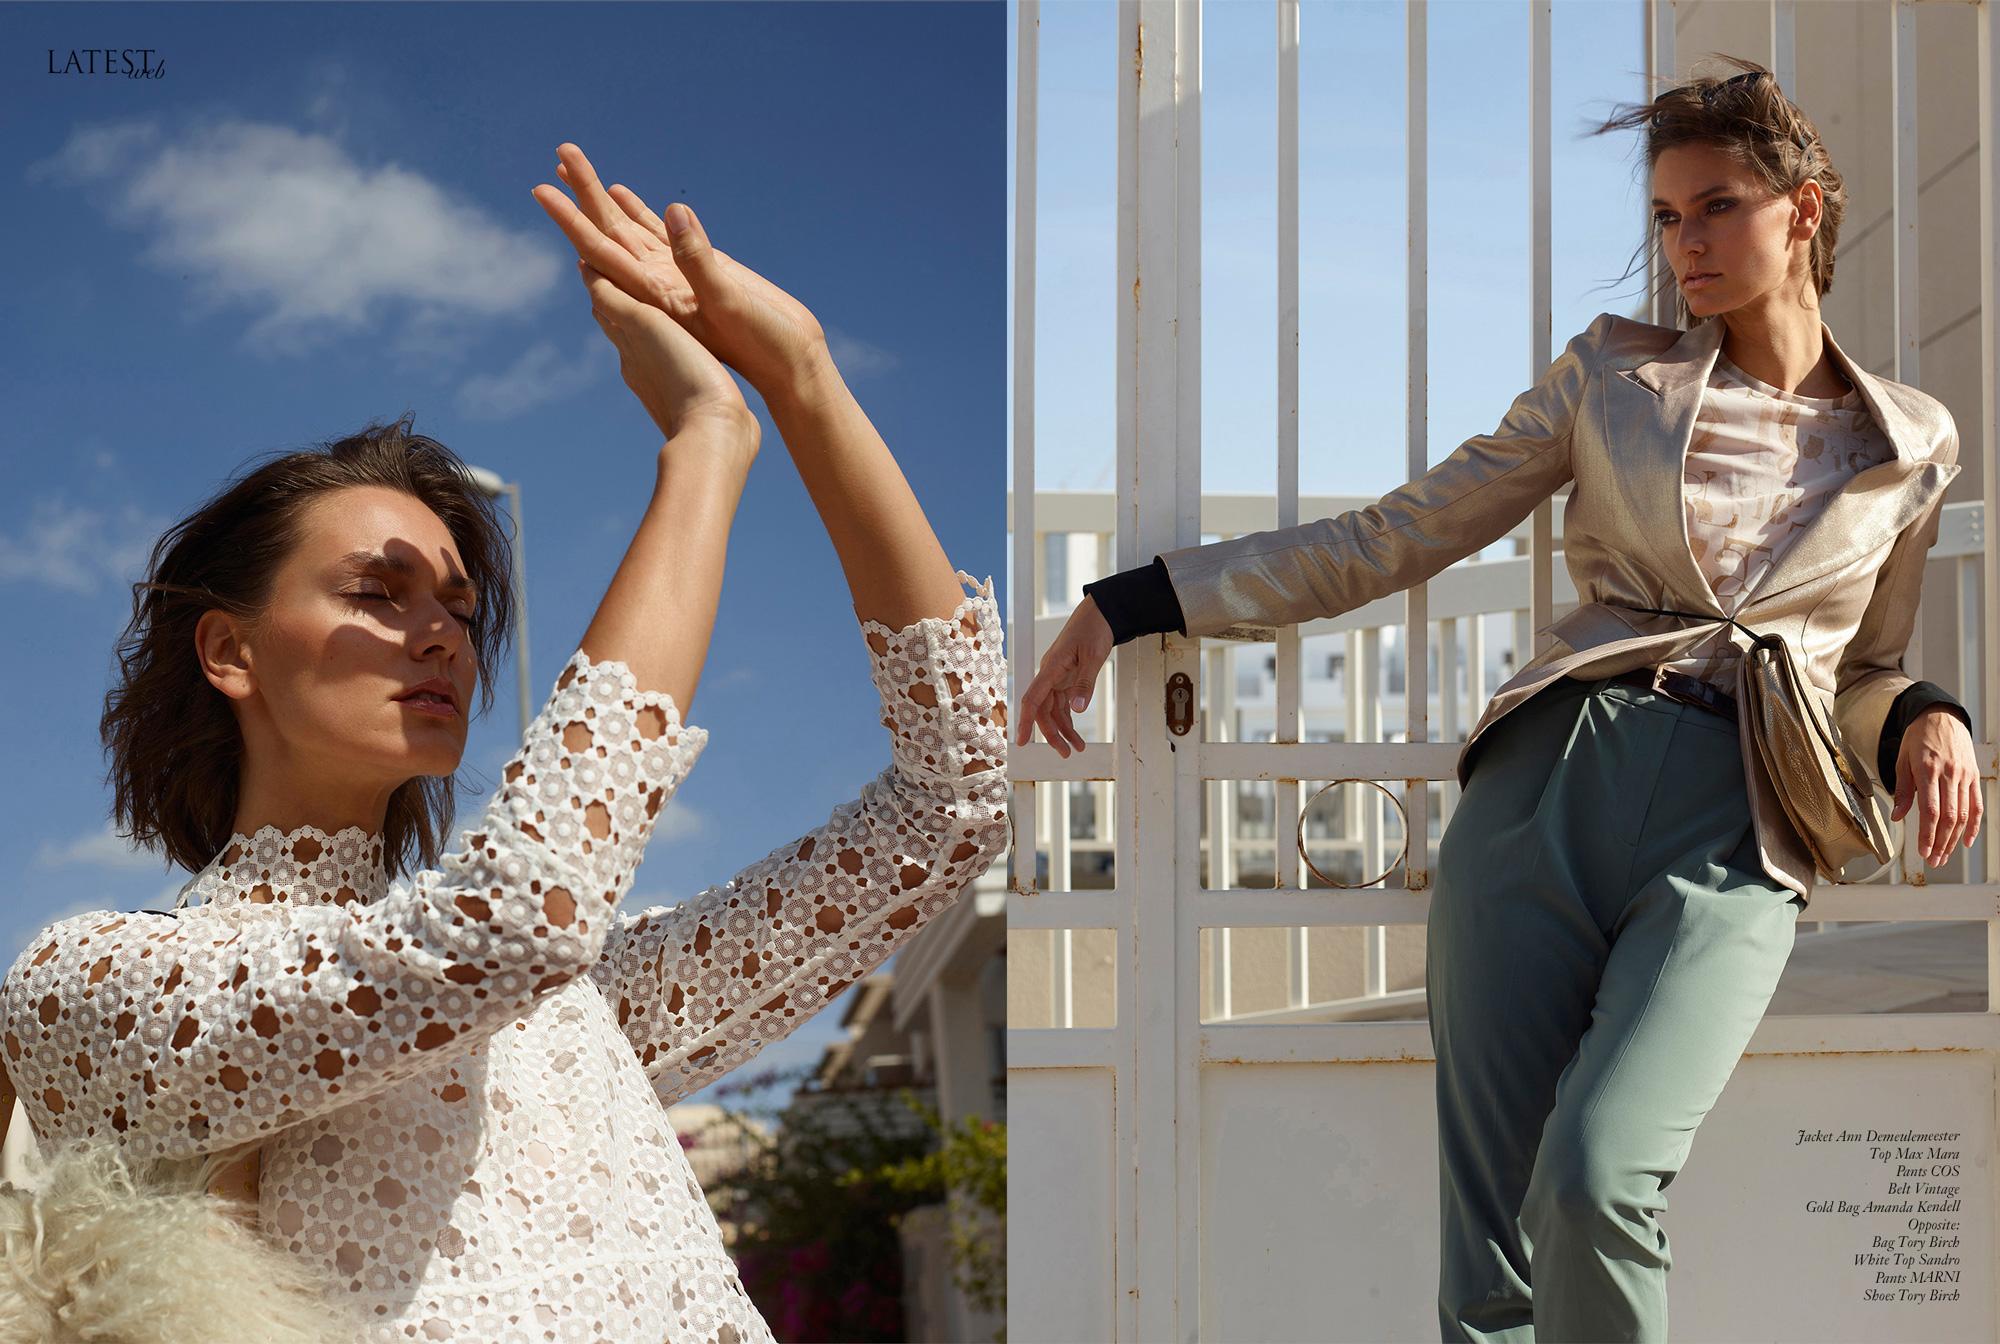 Memories, Klaudia Zdanowicz, model on the streets of Dubai in fashion editorial for Latest magazine. By Ioannis Koussertari